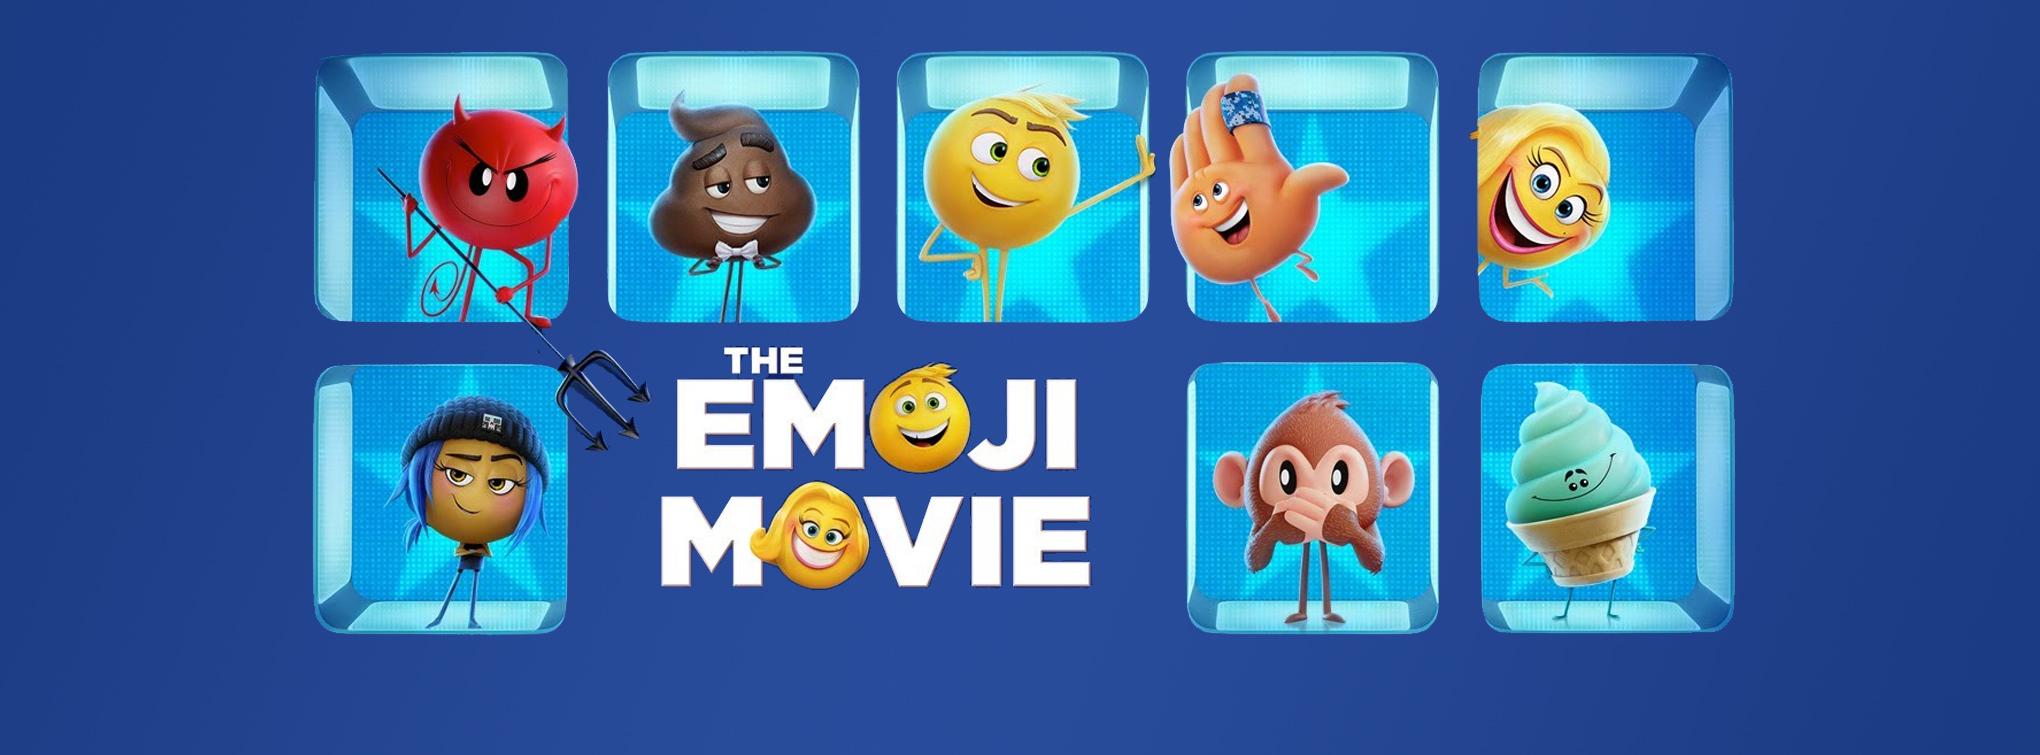 The Emoji Movie premieres Thursday, July 27!